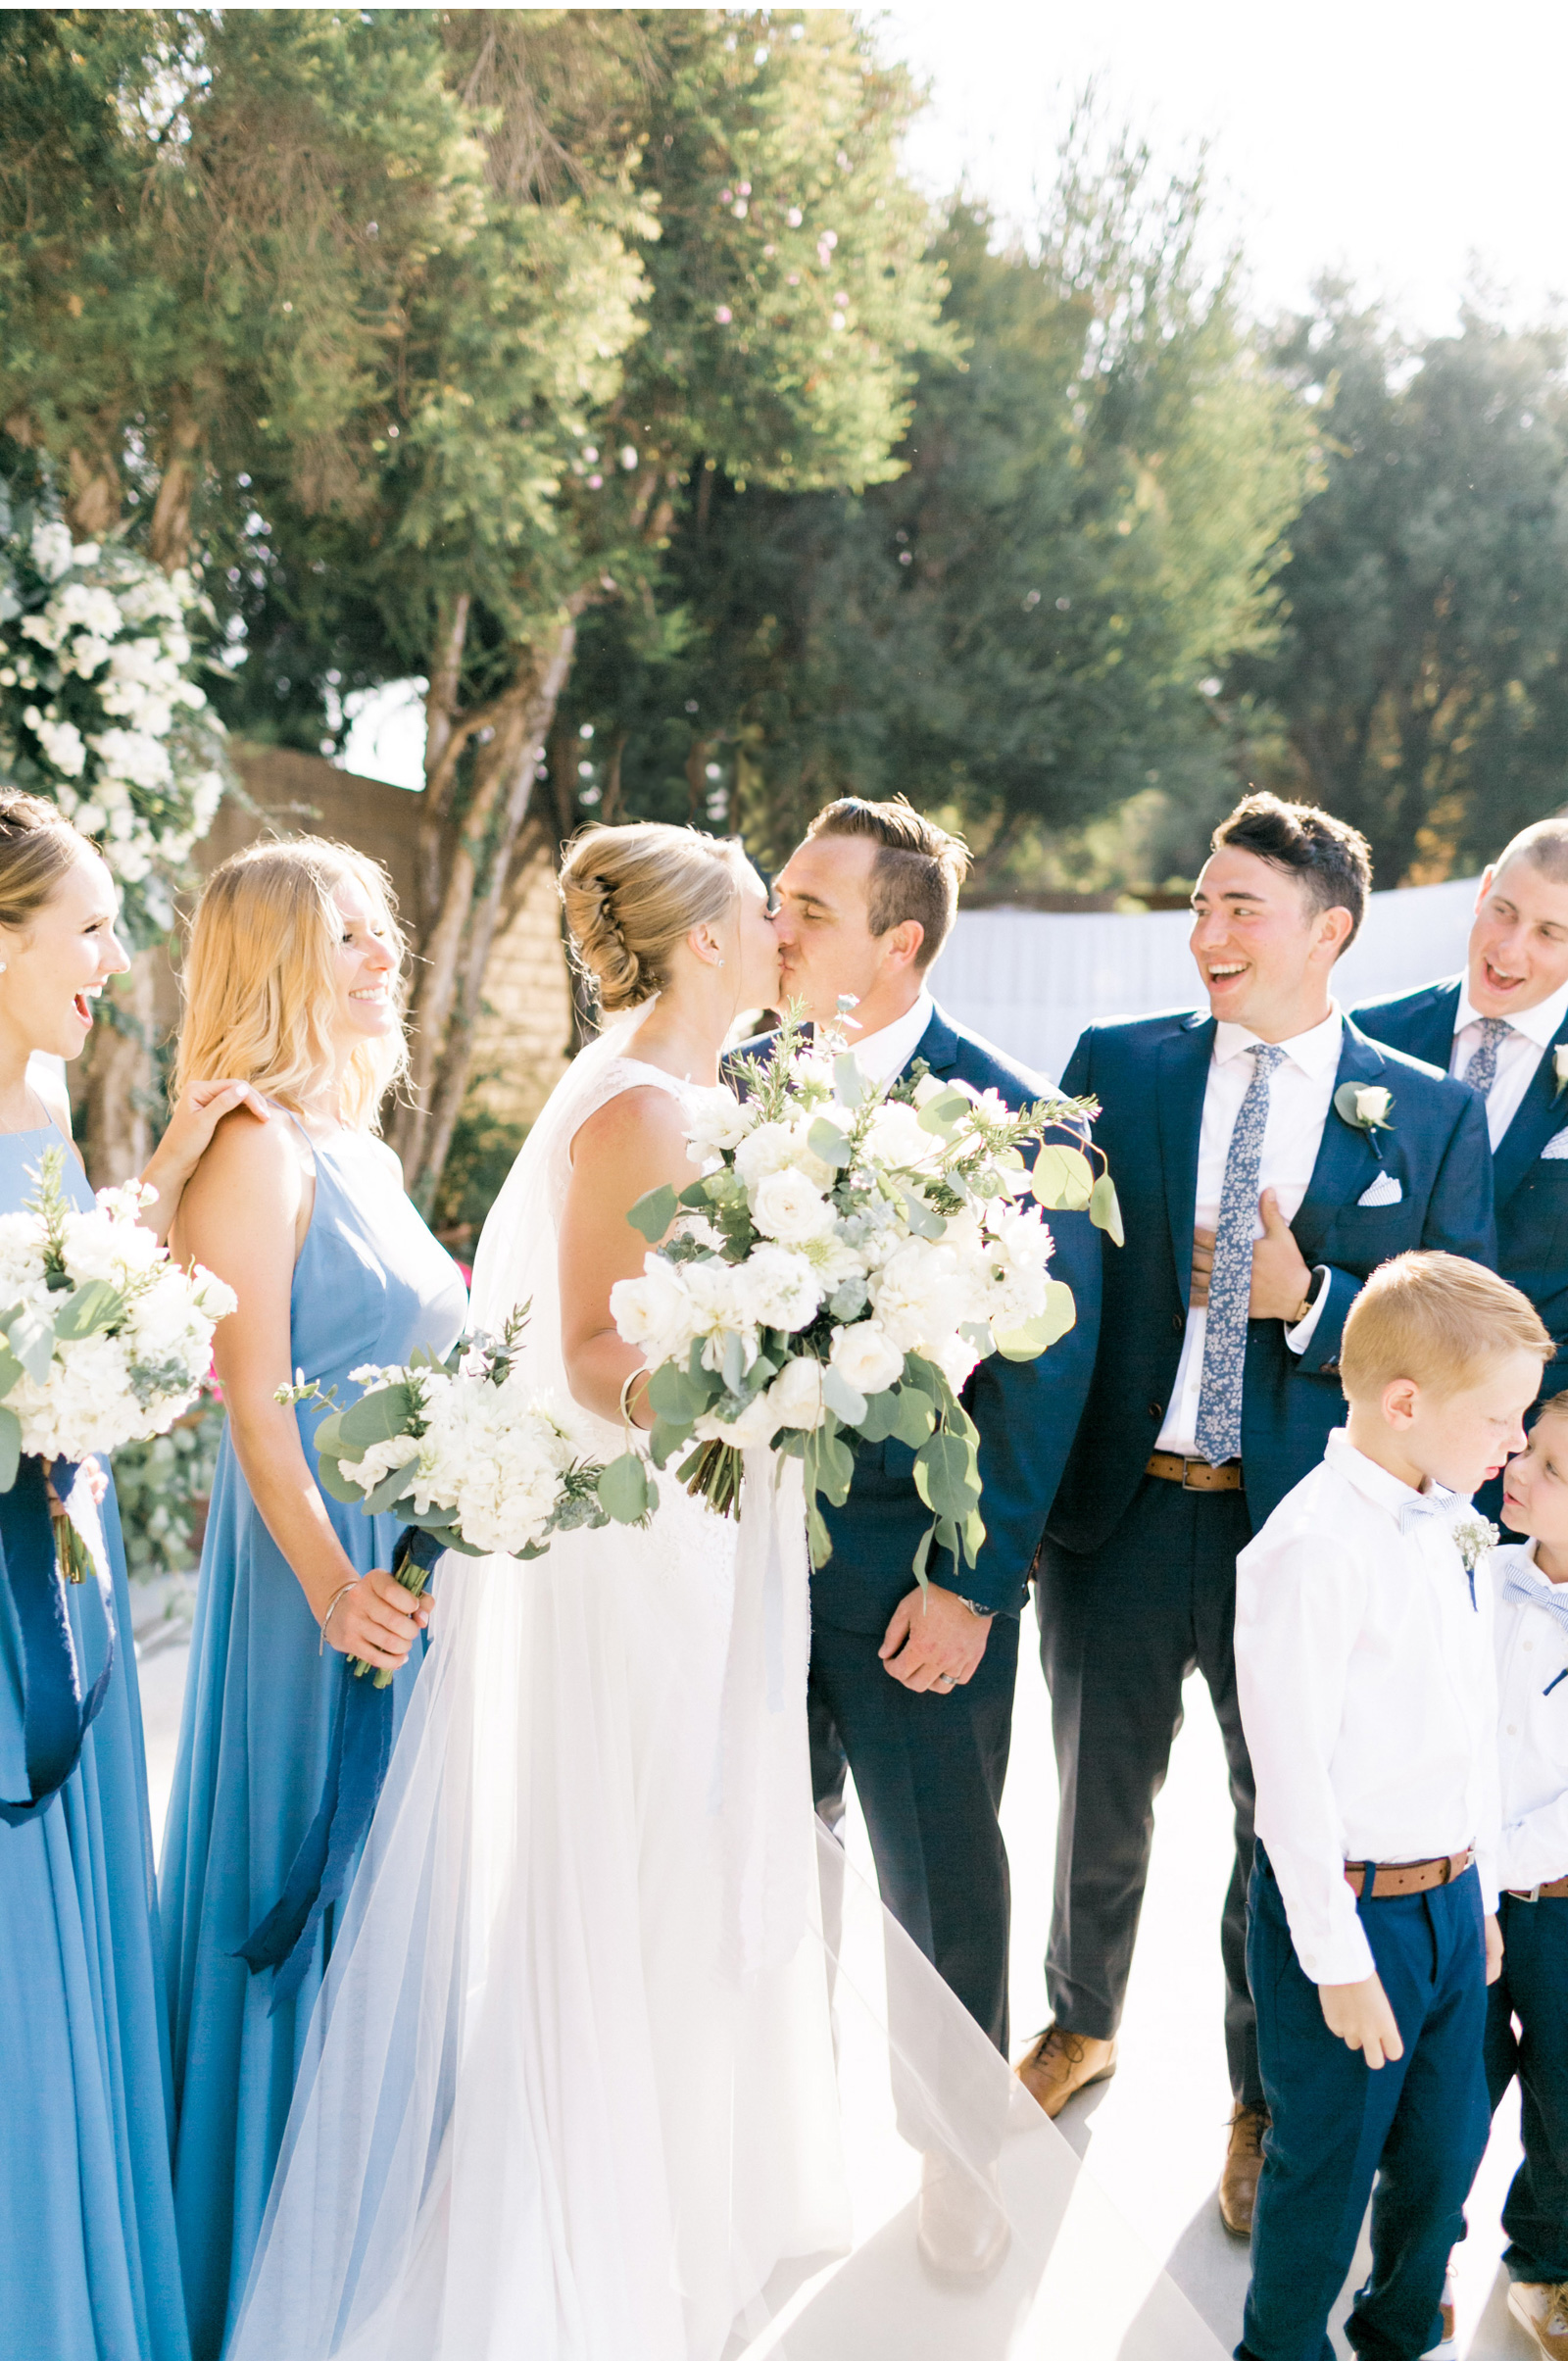 San-Luis-Obispo-Wedding-Photographer-Natalie-Schutt-Photography-Style-Me-Pretty_04.jpg